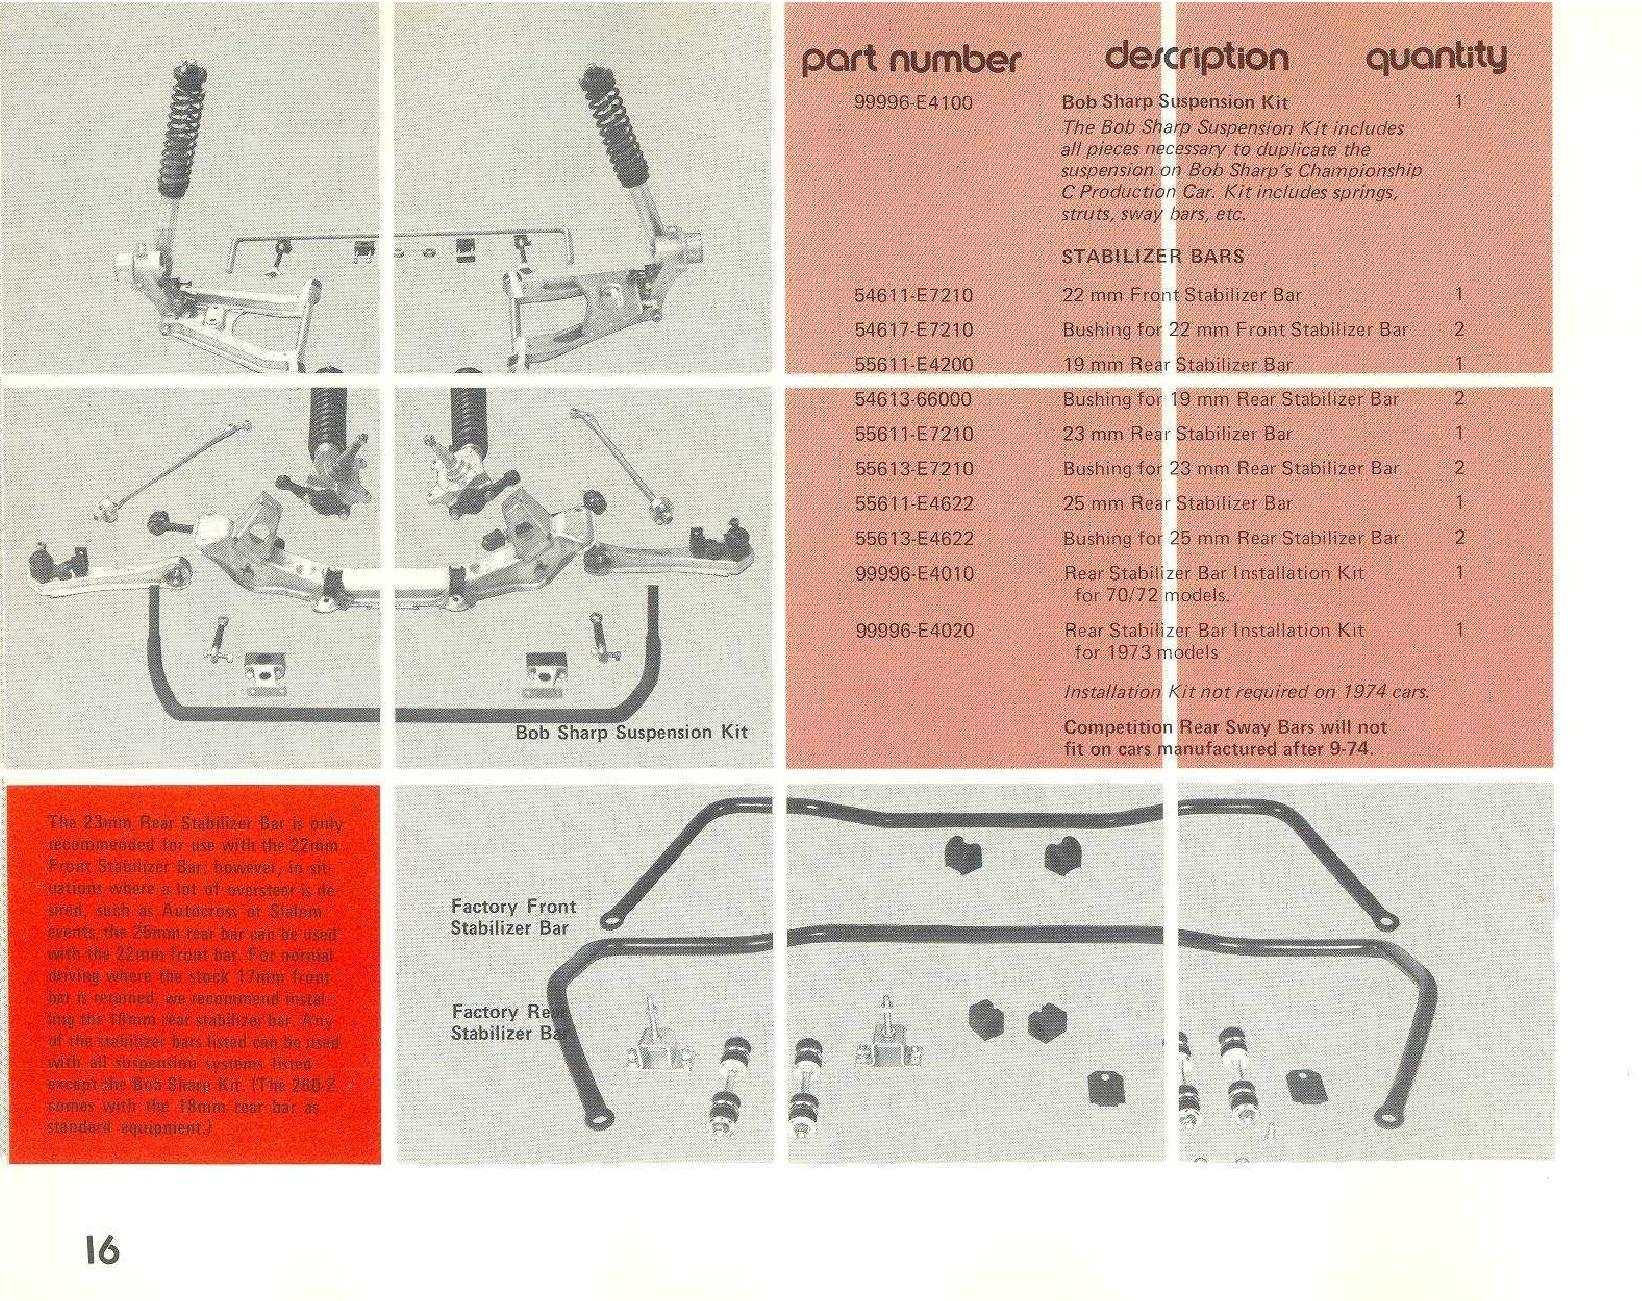 Datsun Competition Parts Catalog 1976